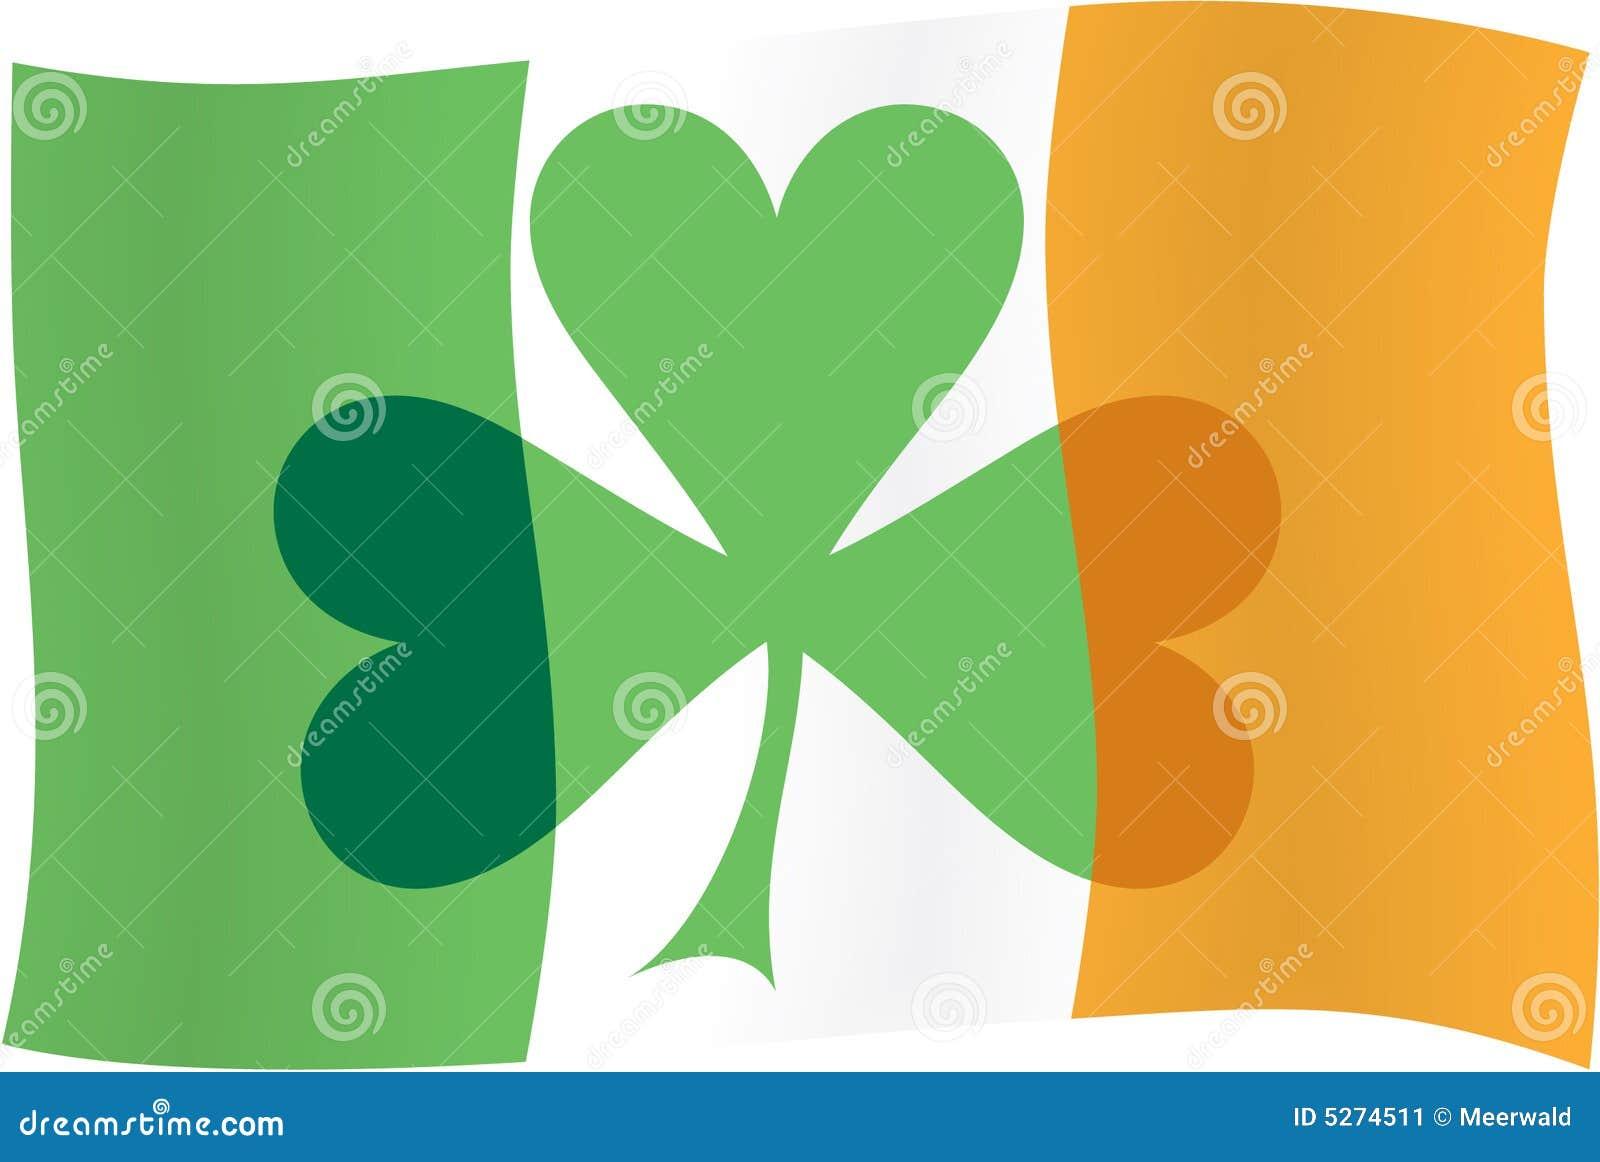 Irish Flag & Irish Shamrock Stock Image - Image: 5274511